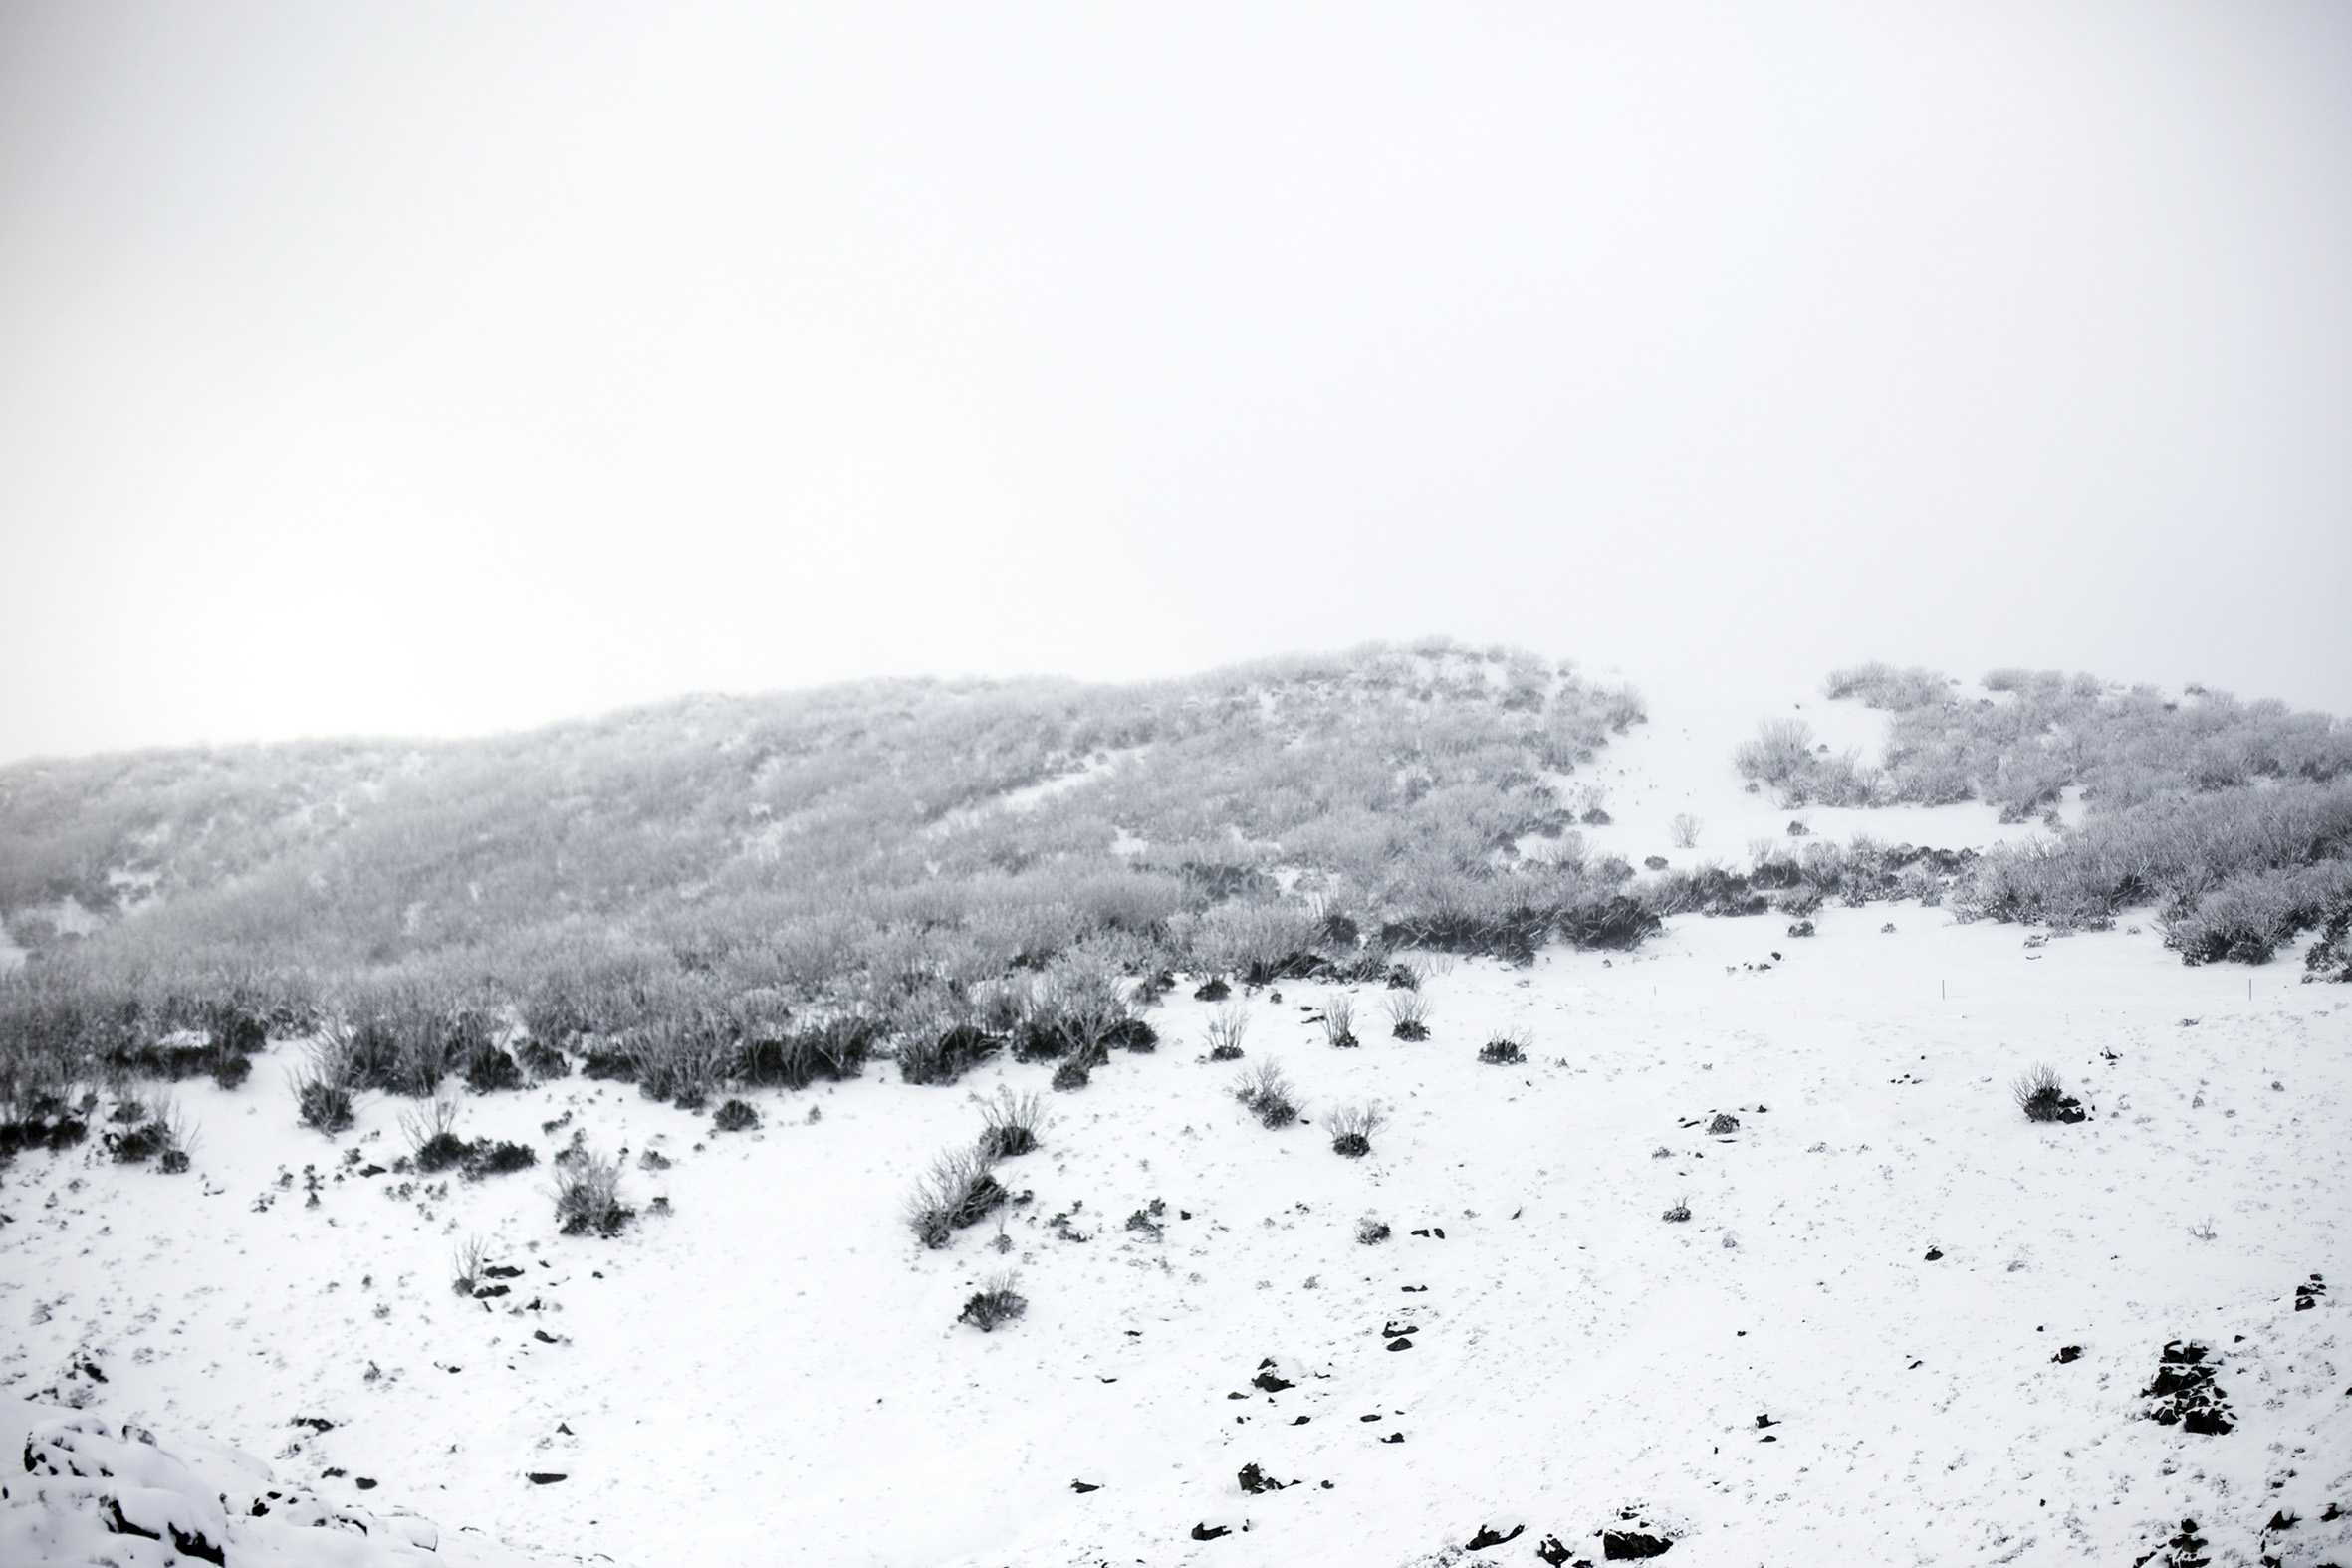 MB snow scape.jpg